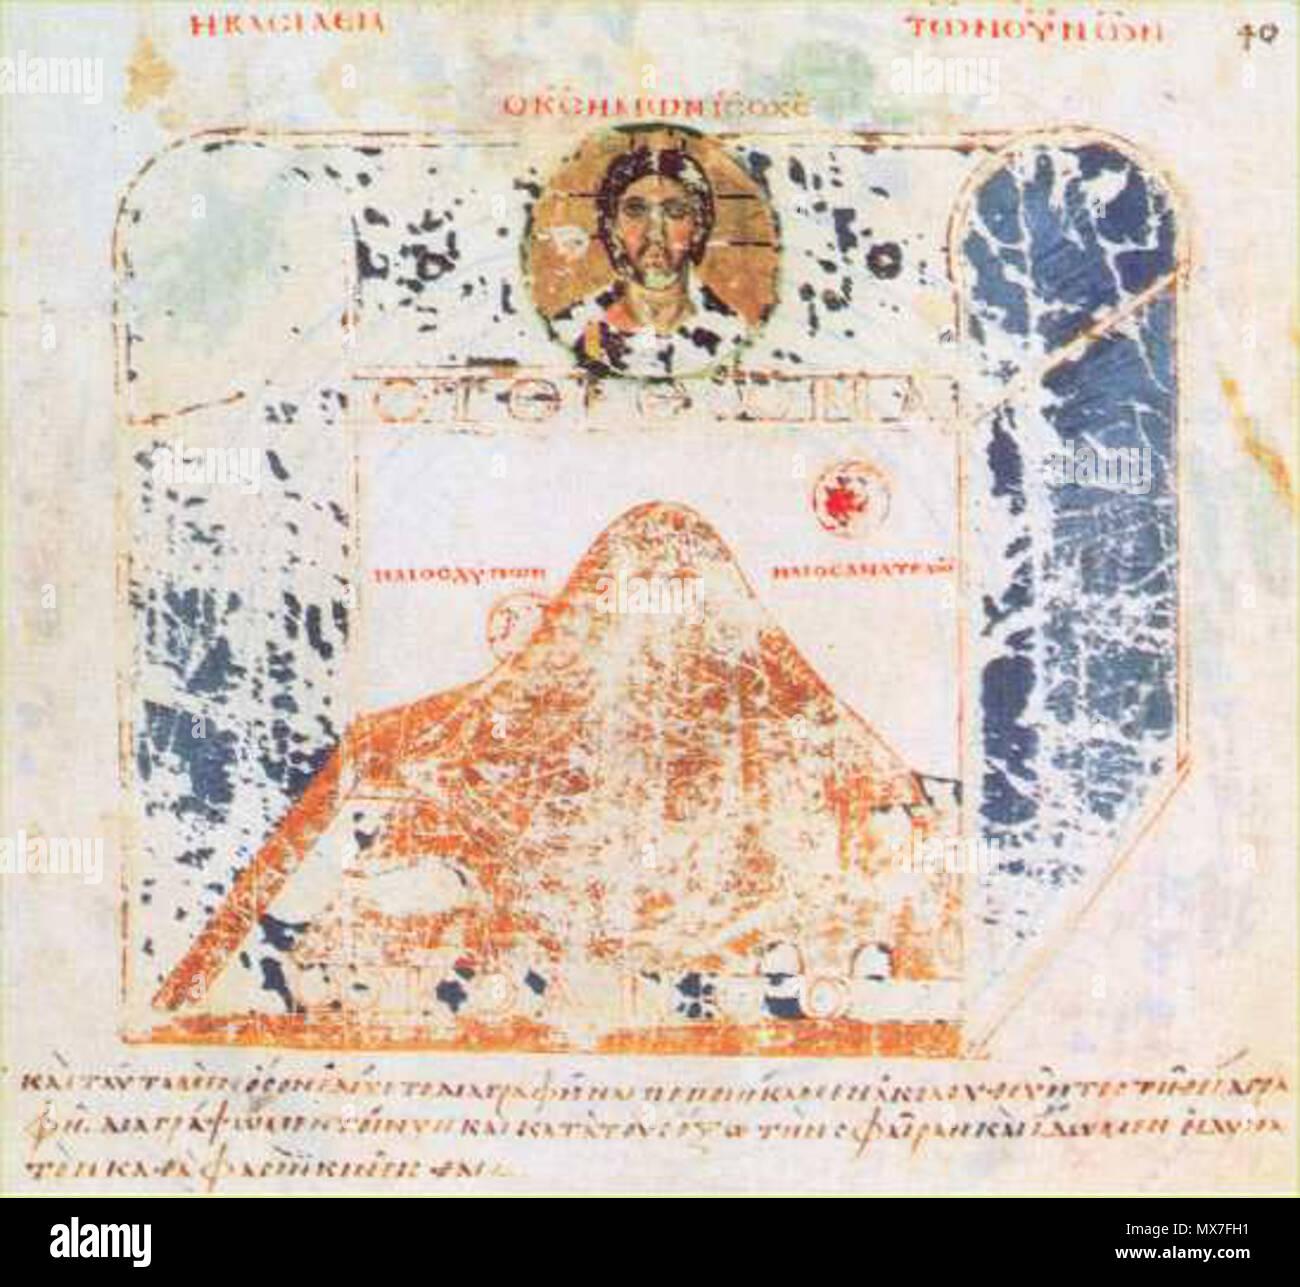 145 Cosmas Indicopleustes - Topographia Christiana 1 - Stock Image